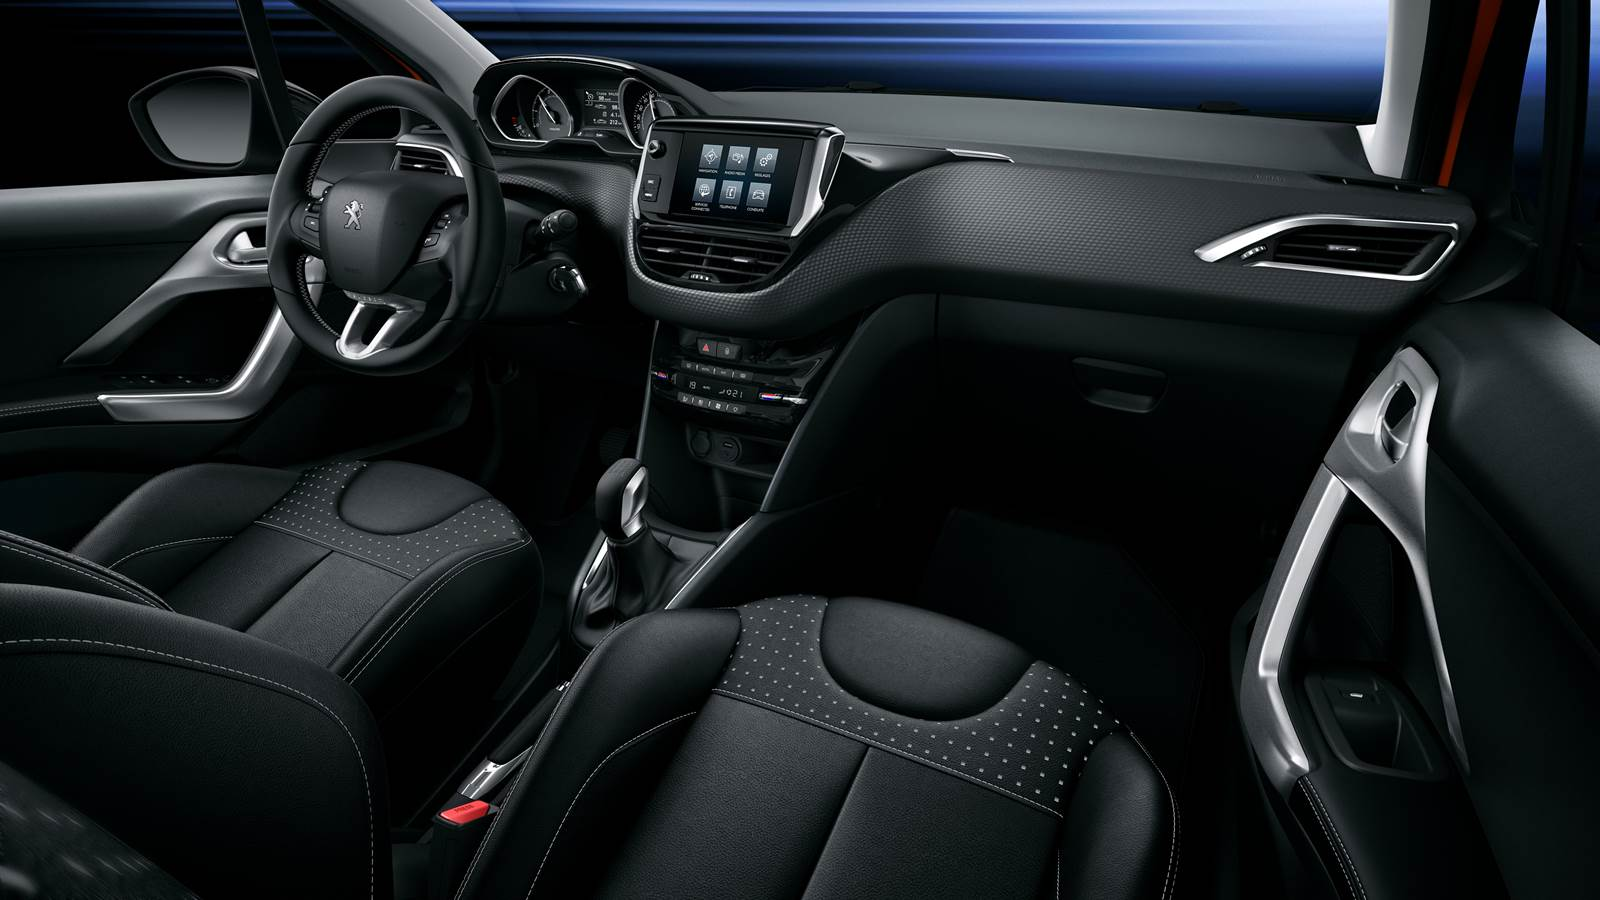 Novo Peugeot 208 2016 - interior